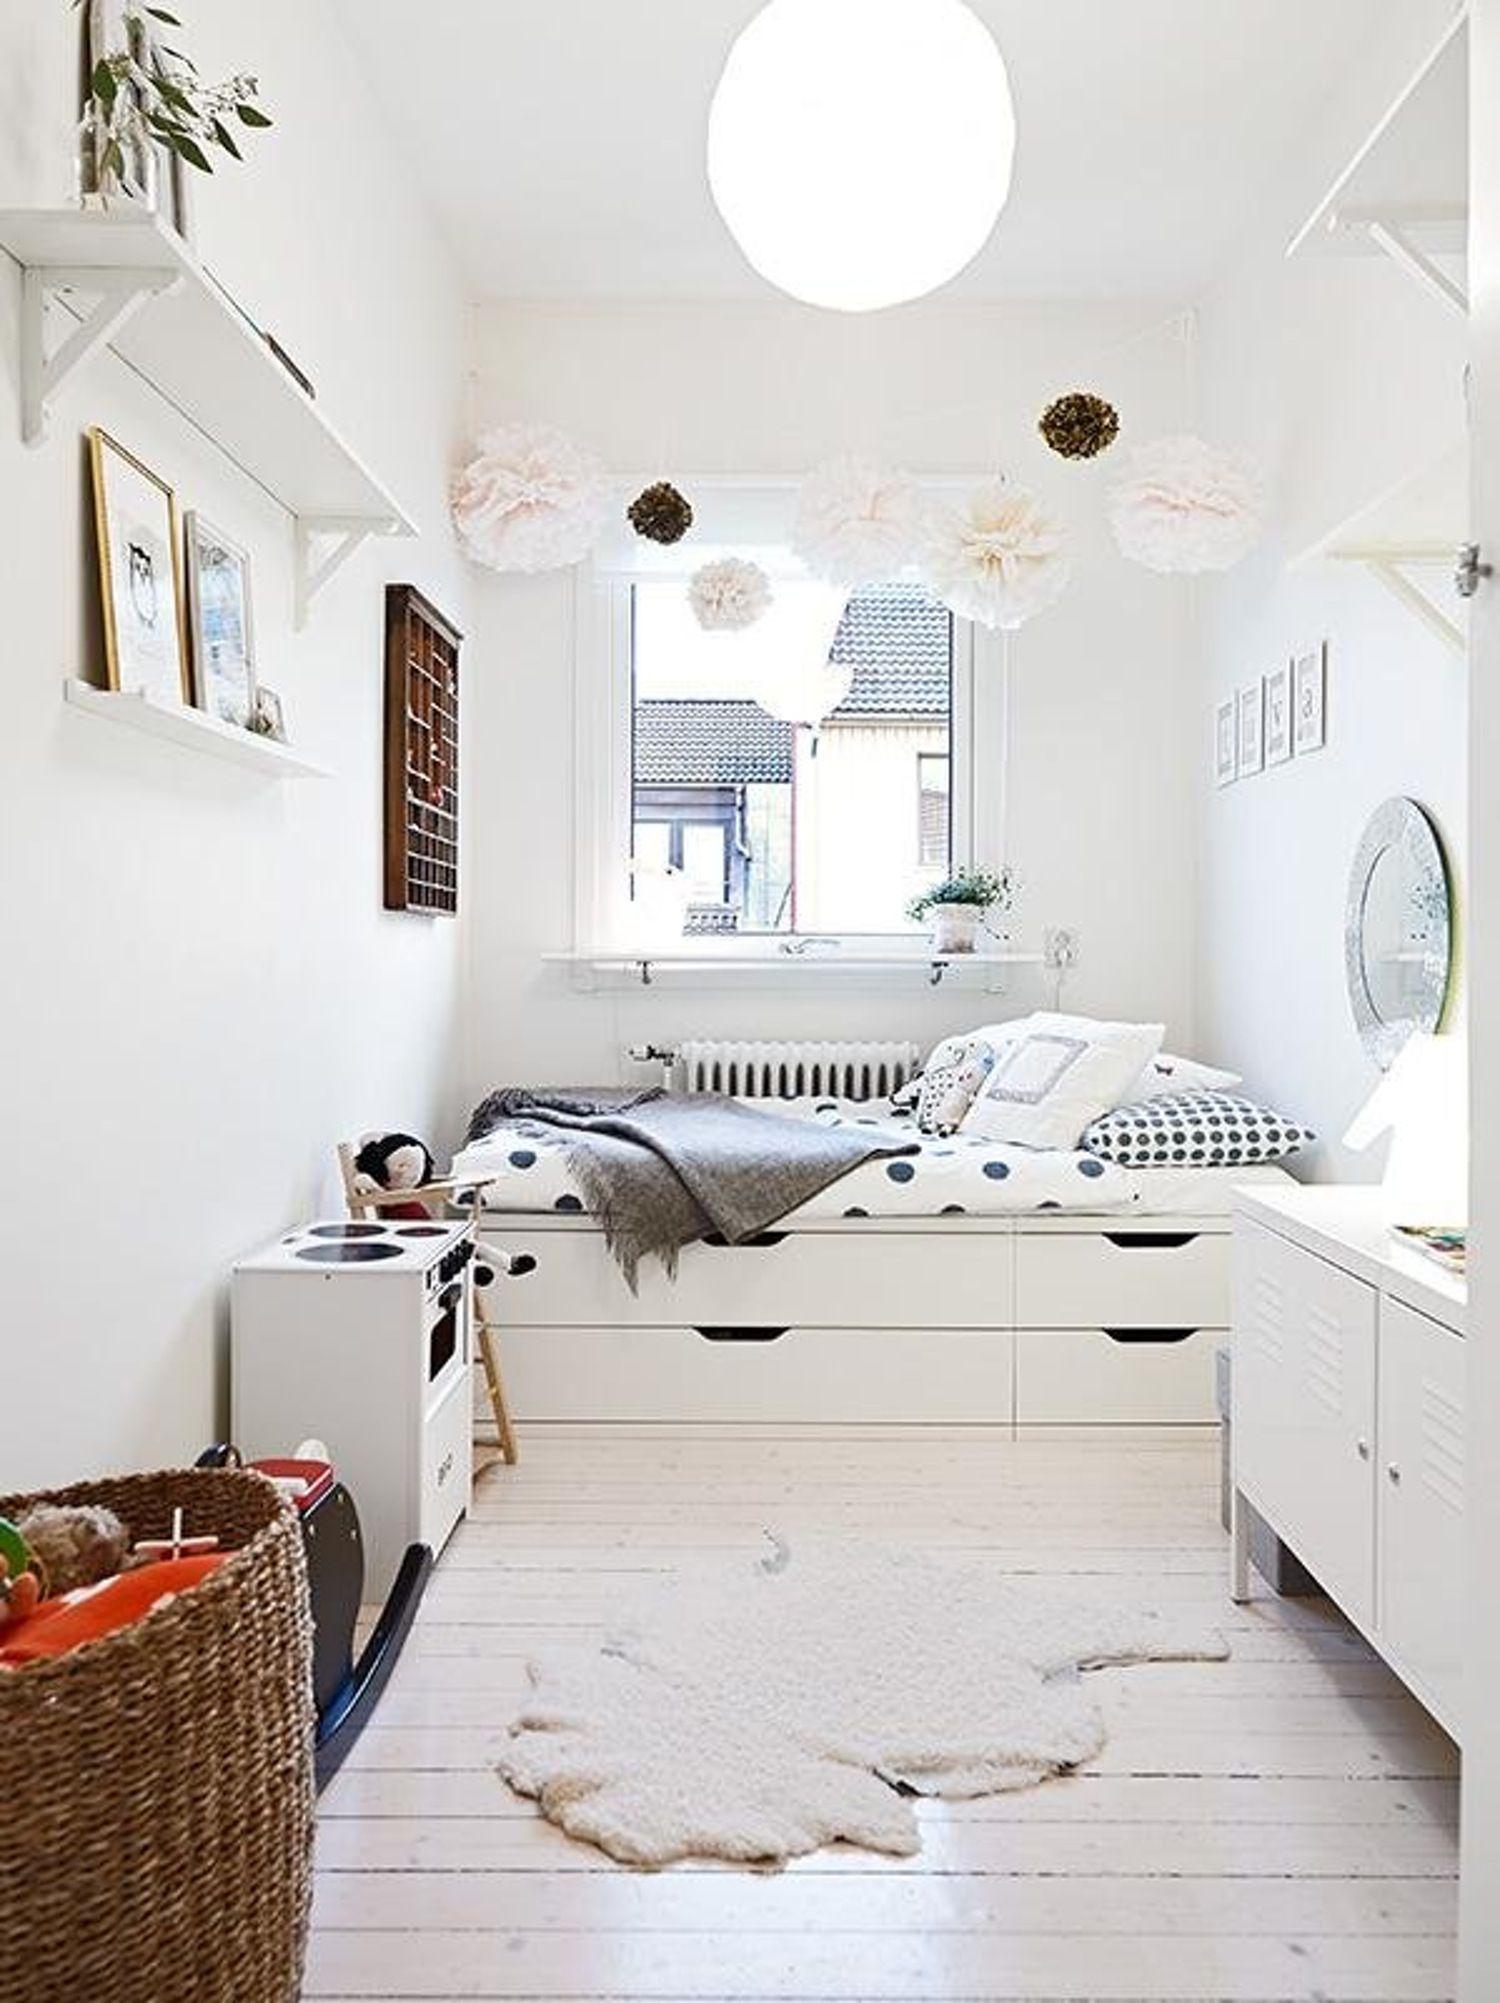 Ikea diy ideas ways to make your own platform bed with storage